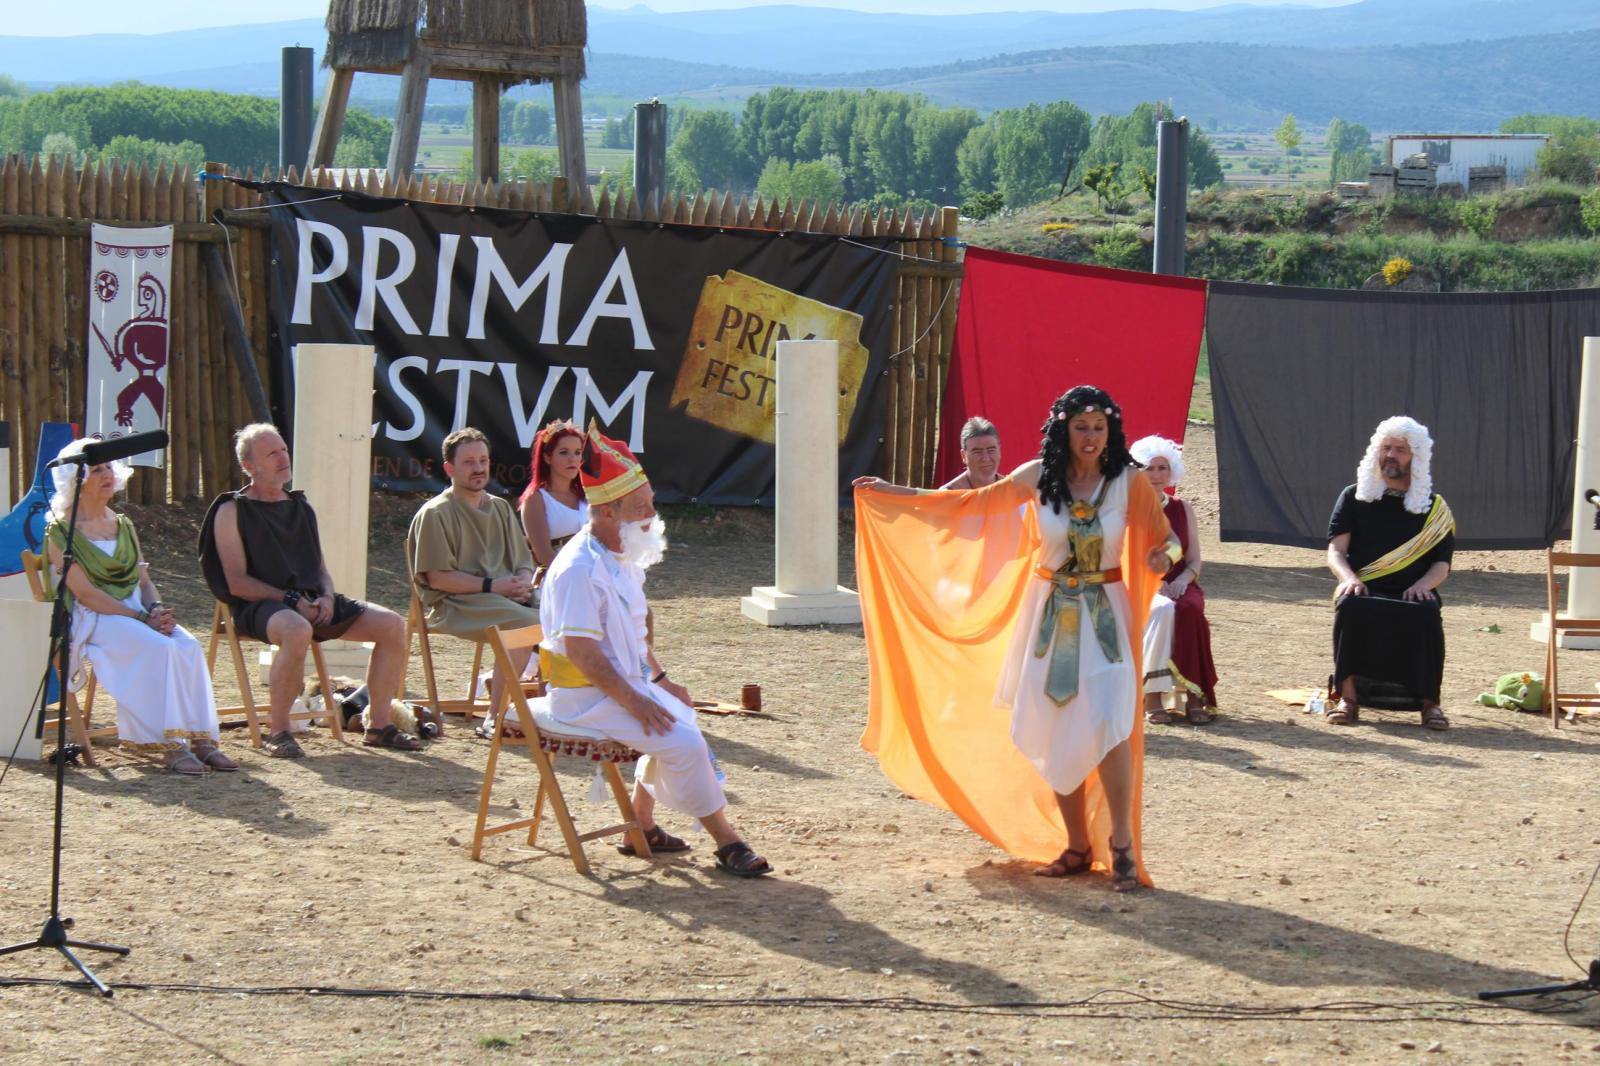 EL III PRIMA FESTUM YA TIENE FINALISTAS